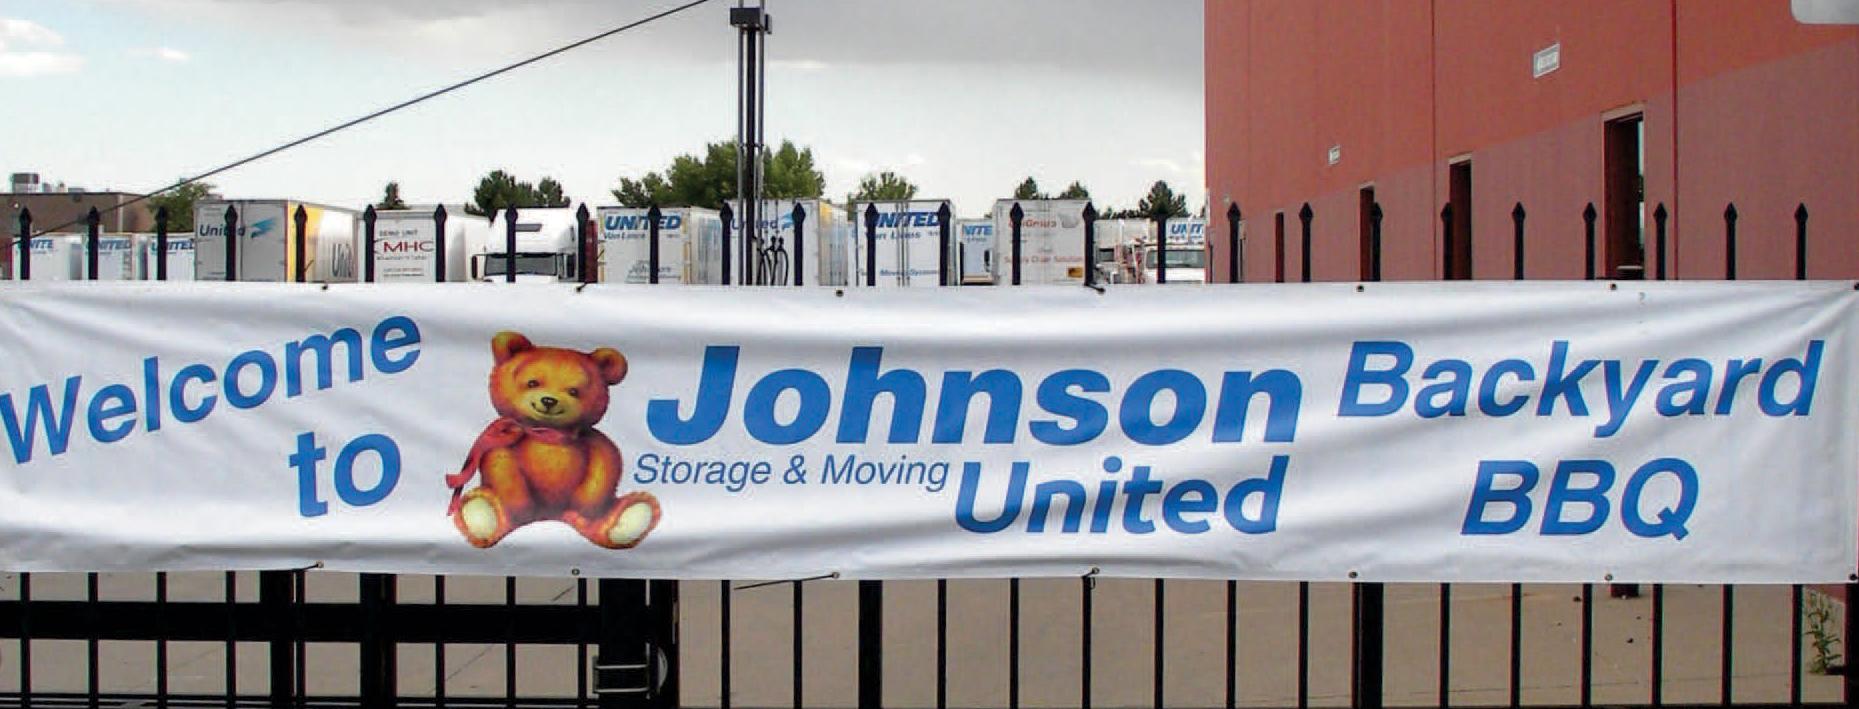 2019 Johnson Storage & Moving BBQ